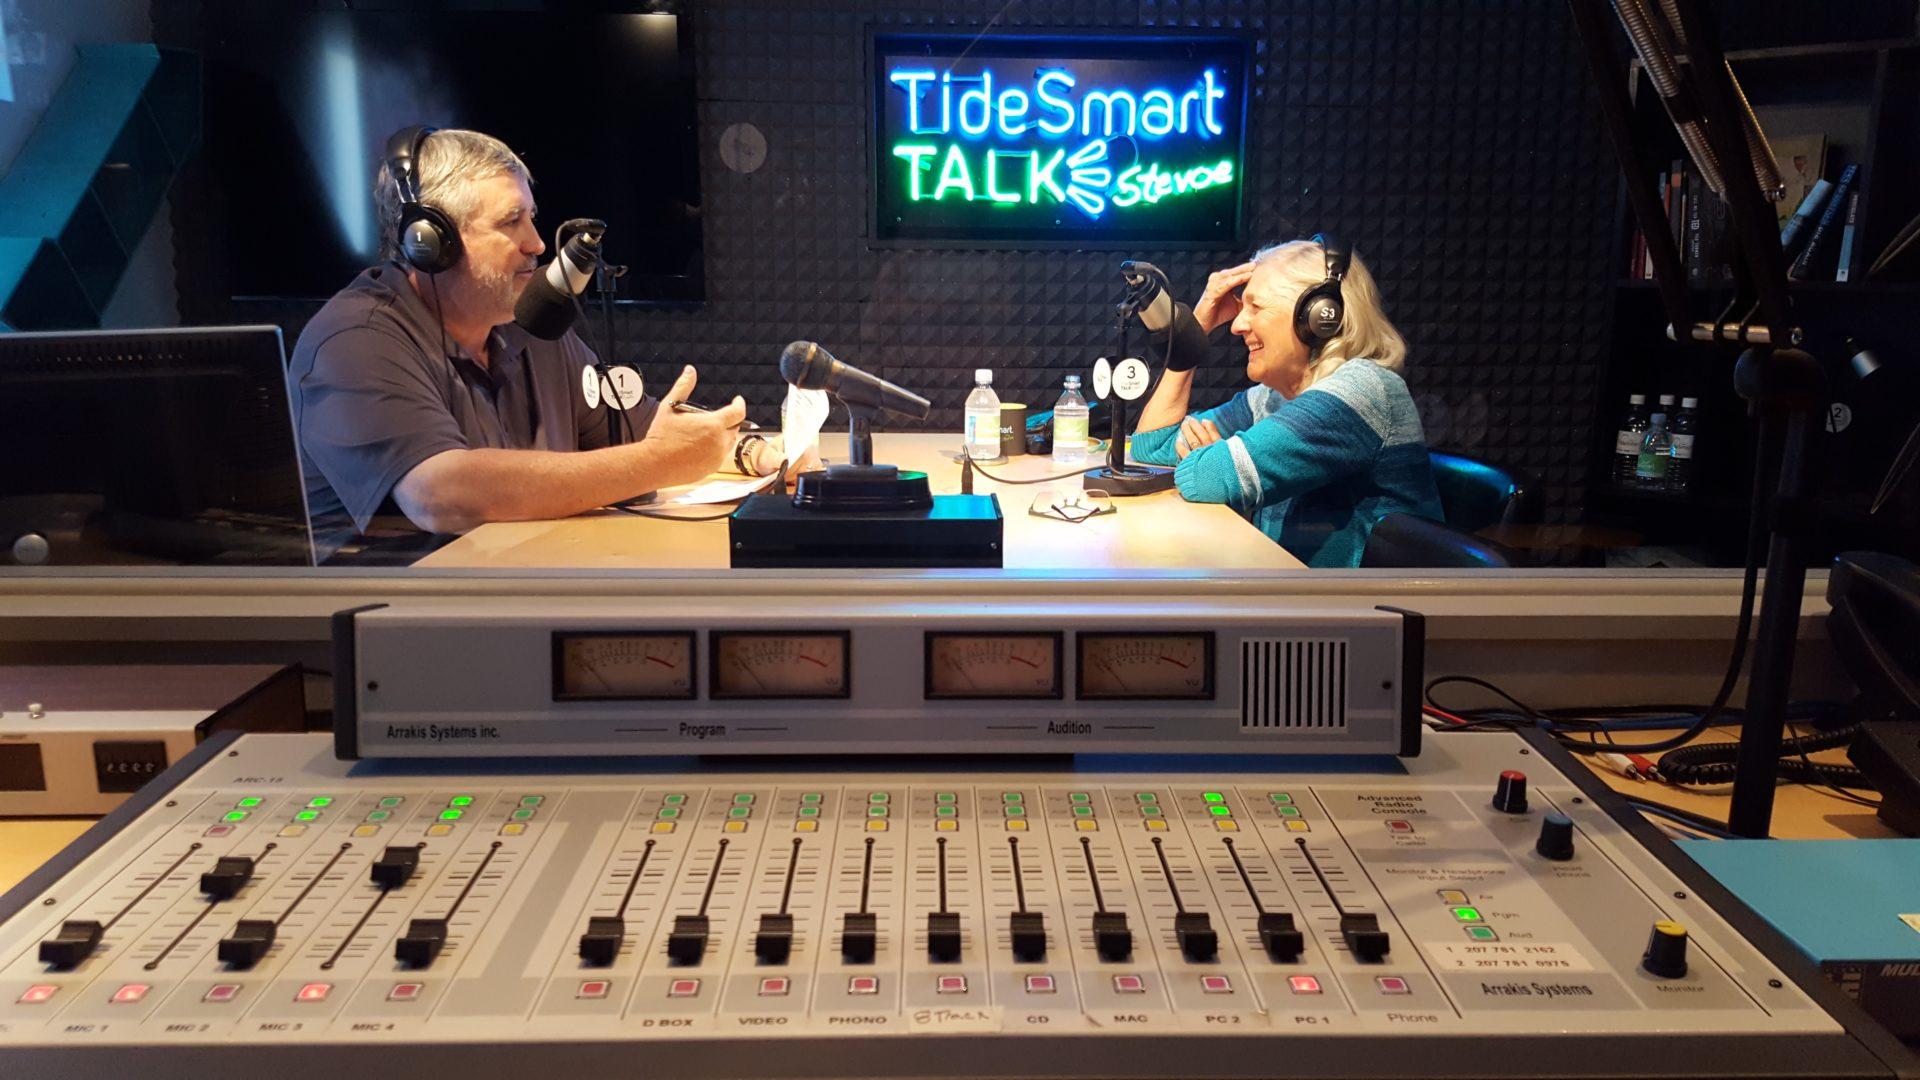 Host of TideSmart Talk with Stevoe, Steve Woods, welcomed Ellen Goodman (at right).